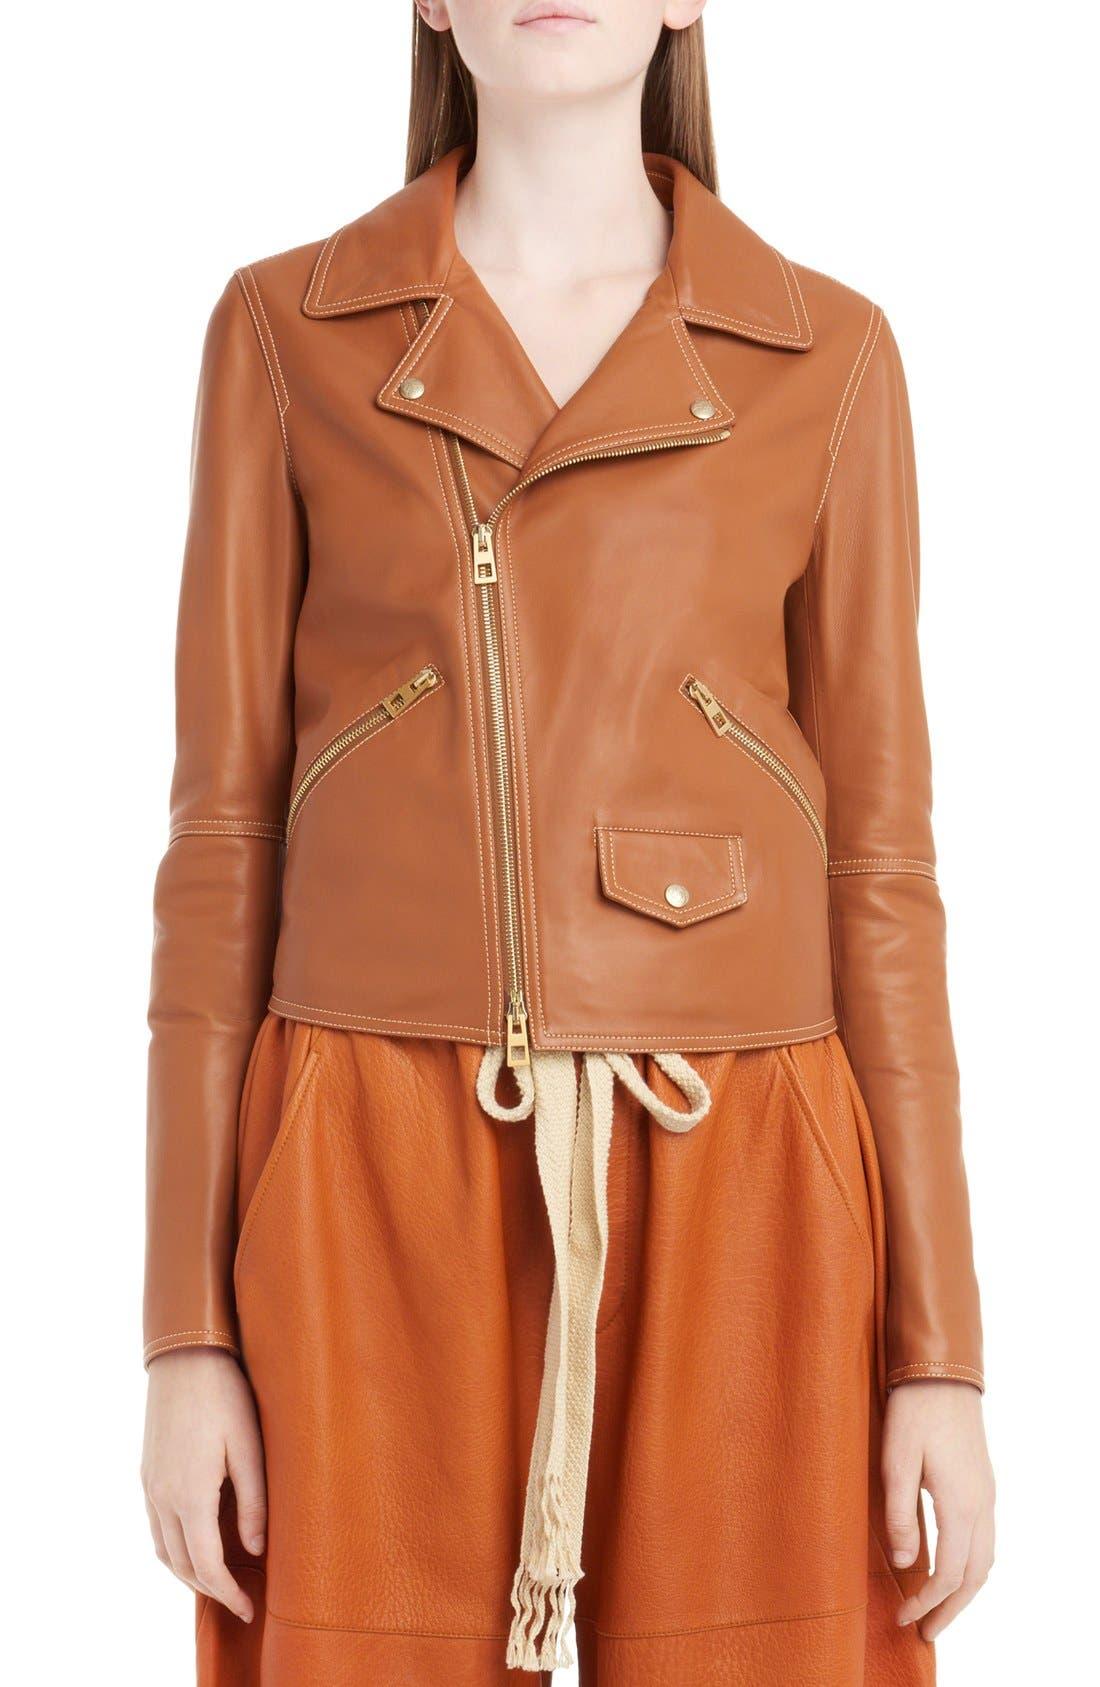 Alternate Image 1 Selected - Loewe Nappa Leather Biker Jacket